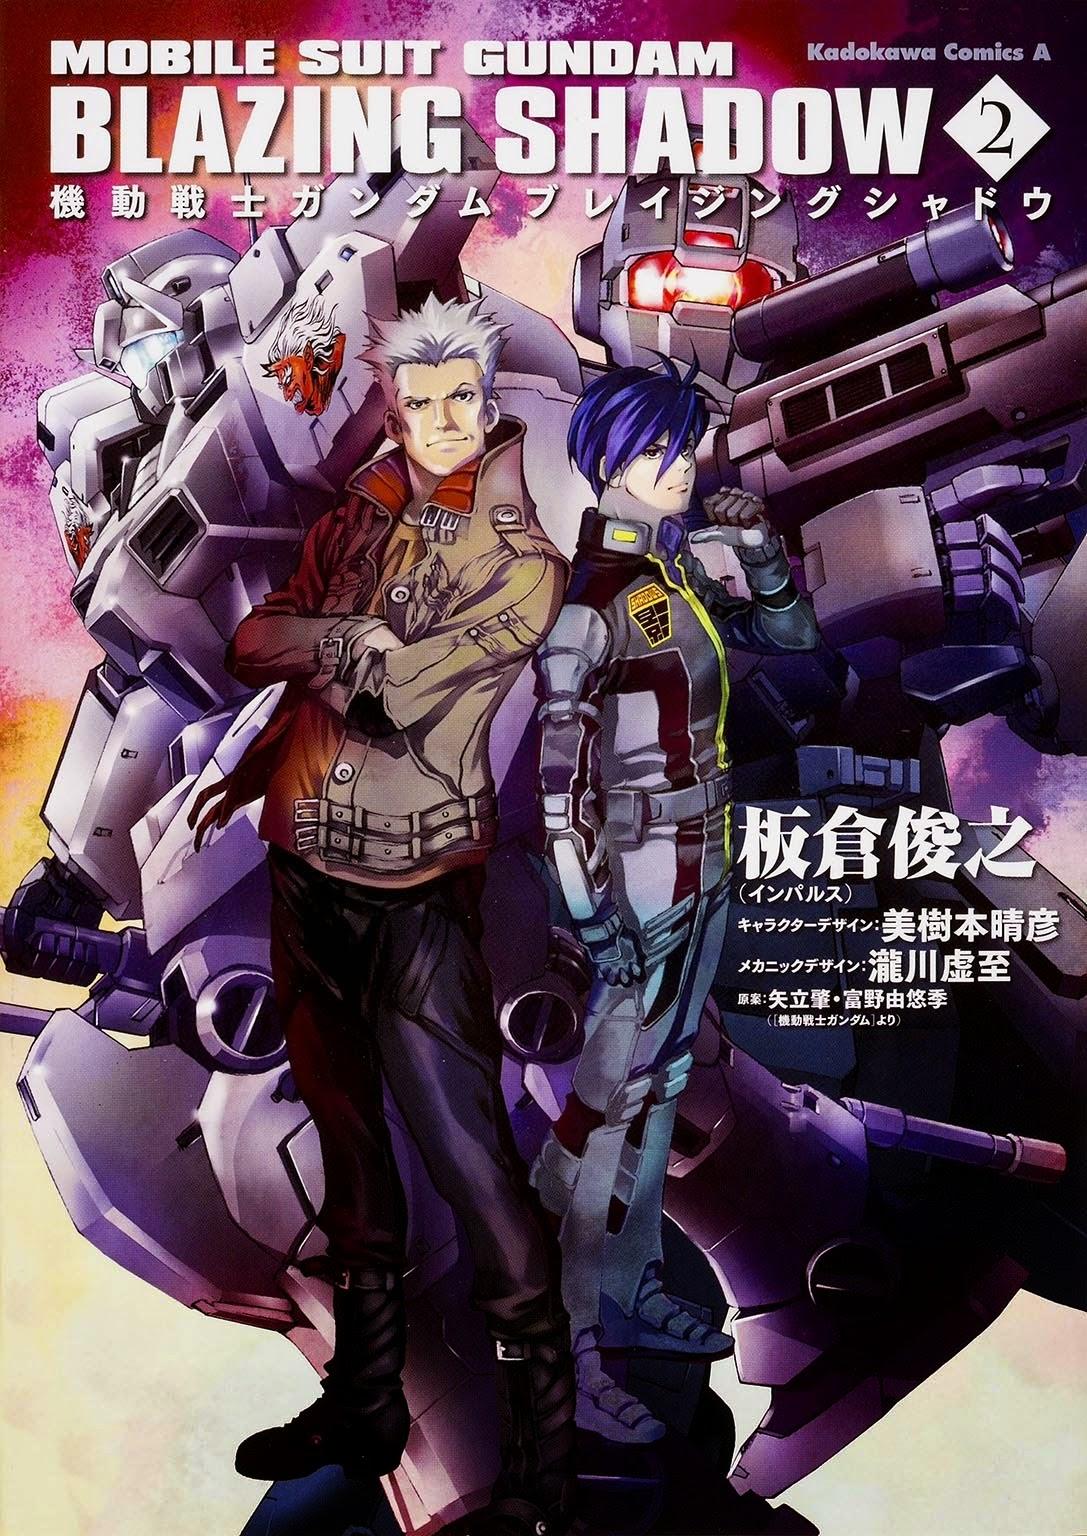 Mobile Suit Gundam: The Blazing Shadow | The Gundam Wiki